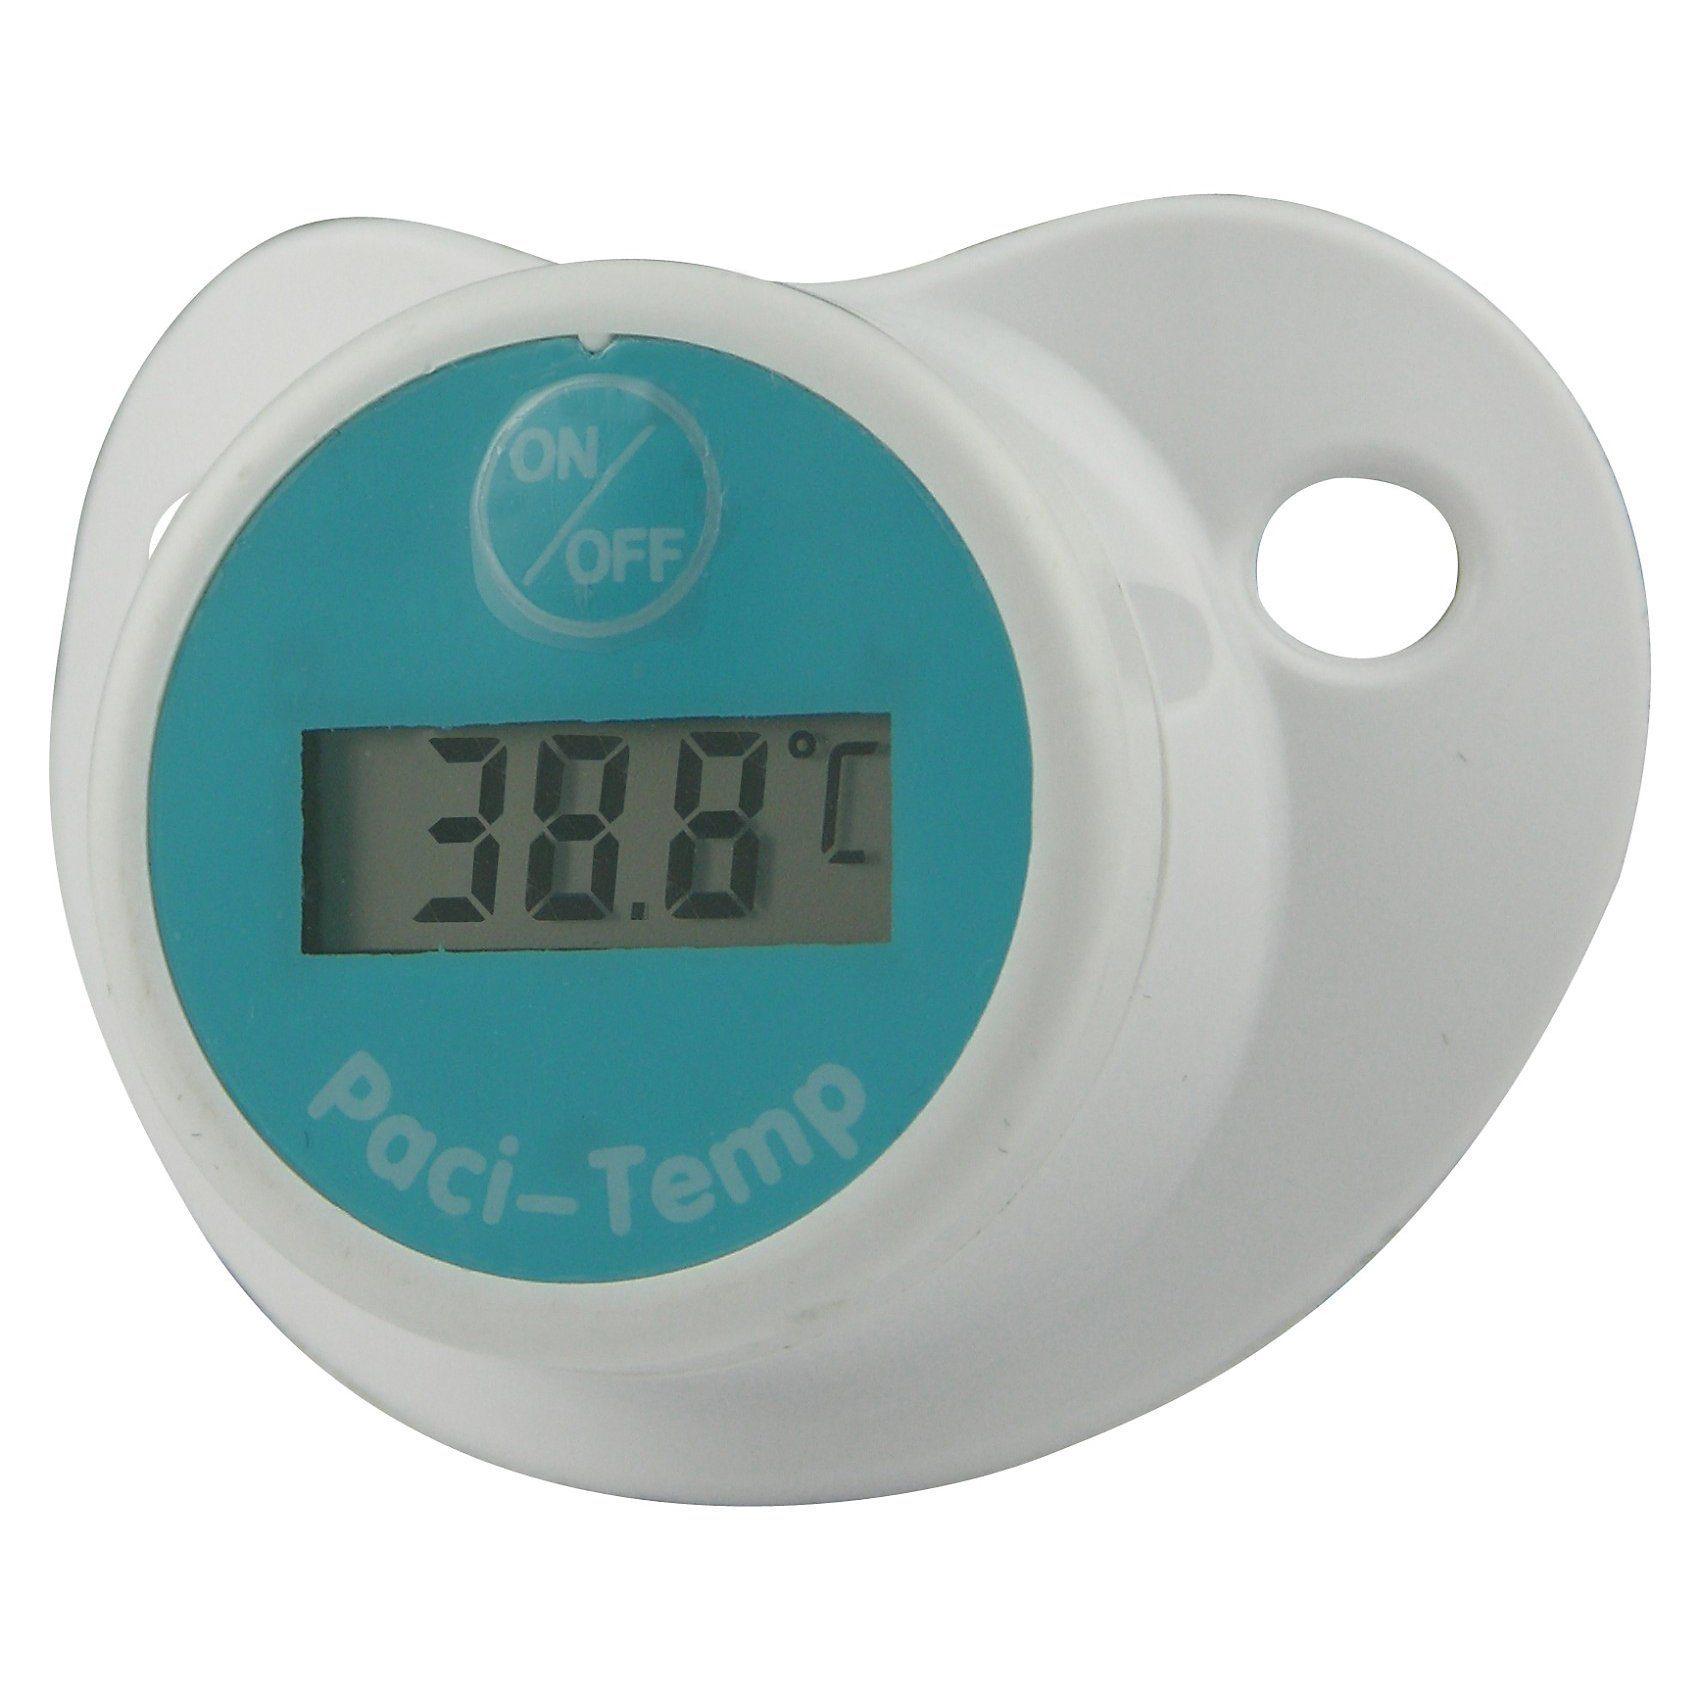 H + H babyruf Schnuller-Thermometer BS 32